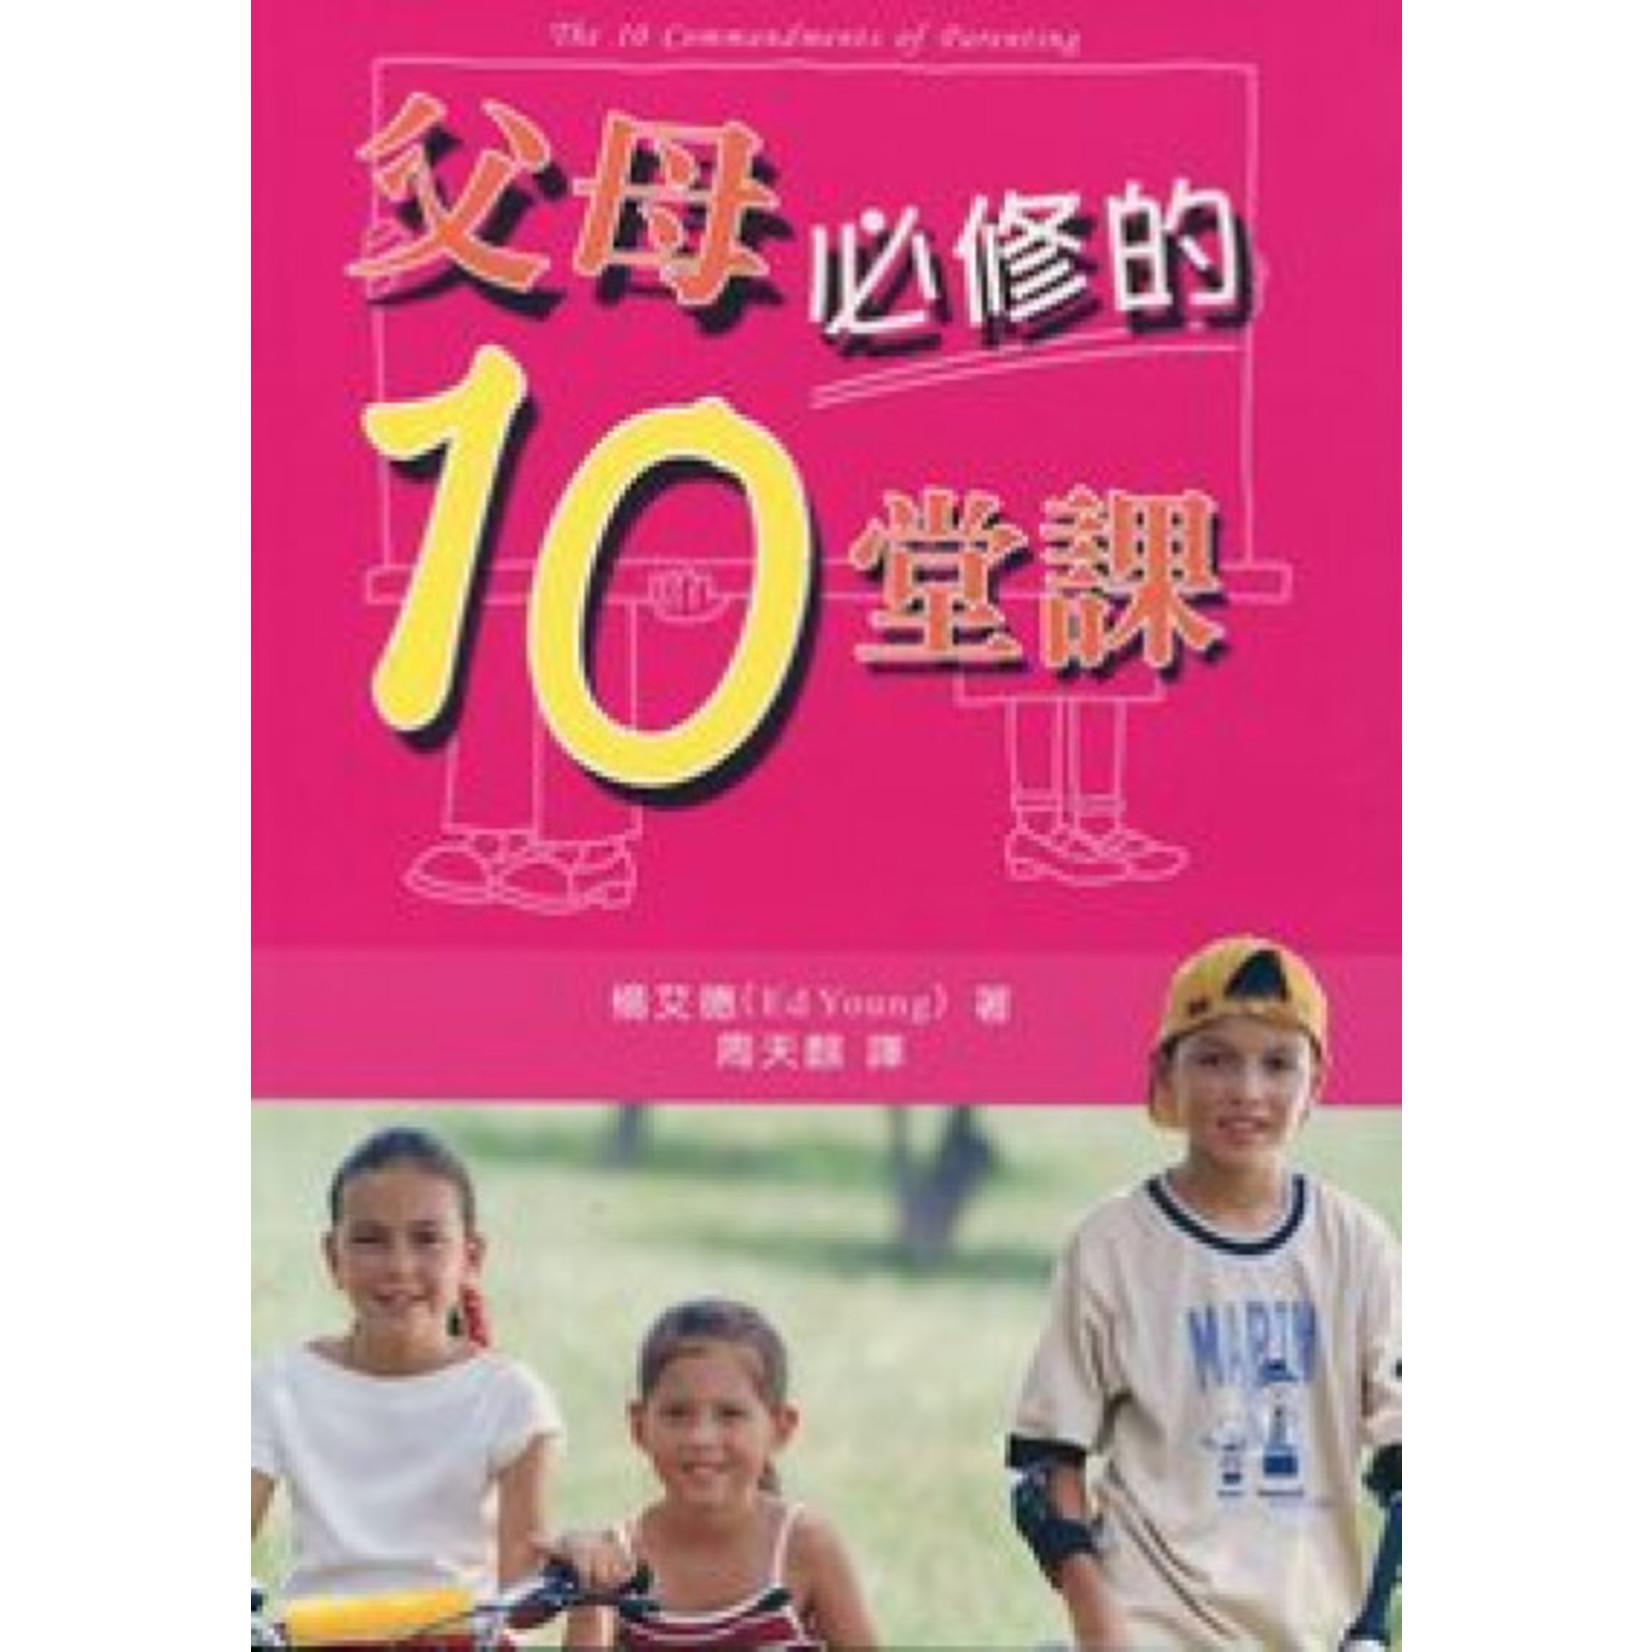 中國主日學協會 China Sunday School Association 父母必修的10堂課 The 10 Commandments of Parenting